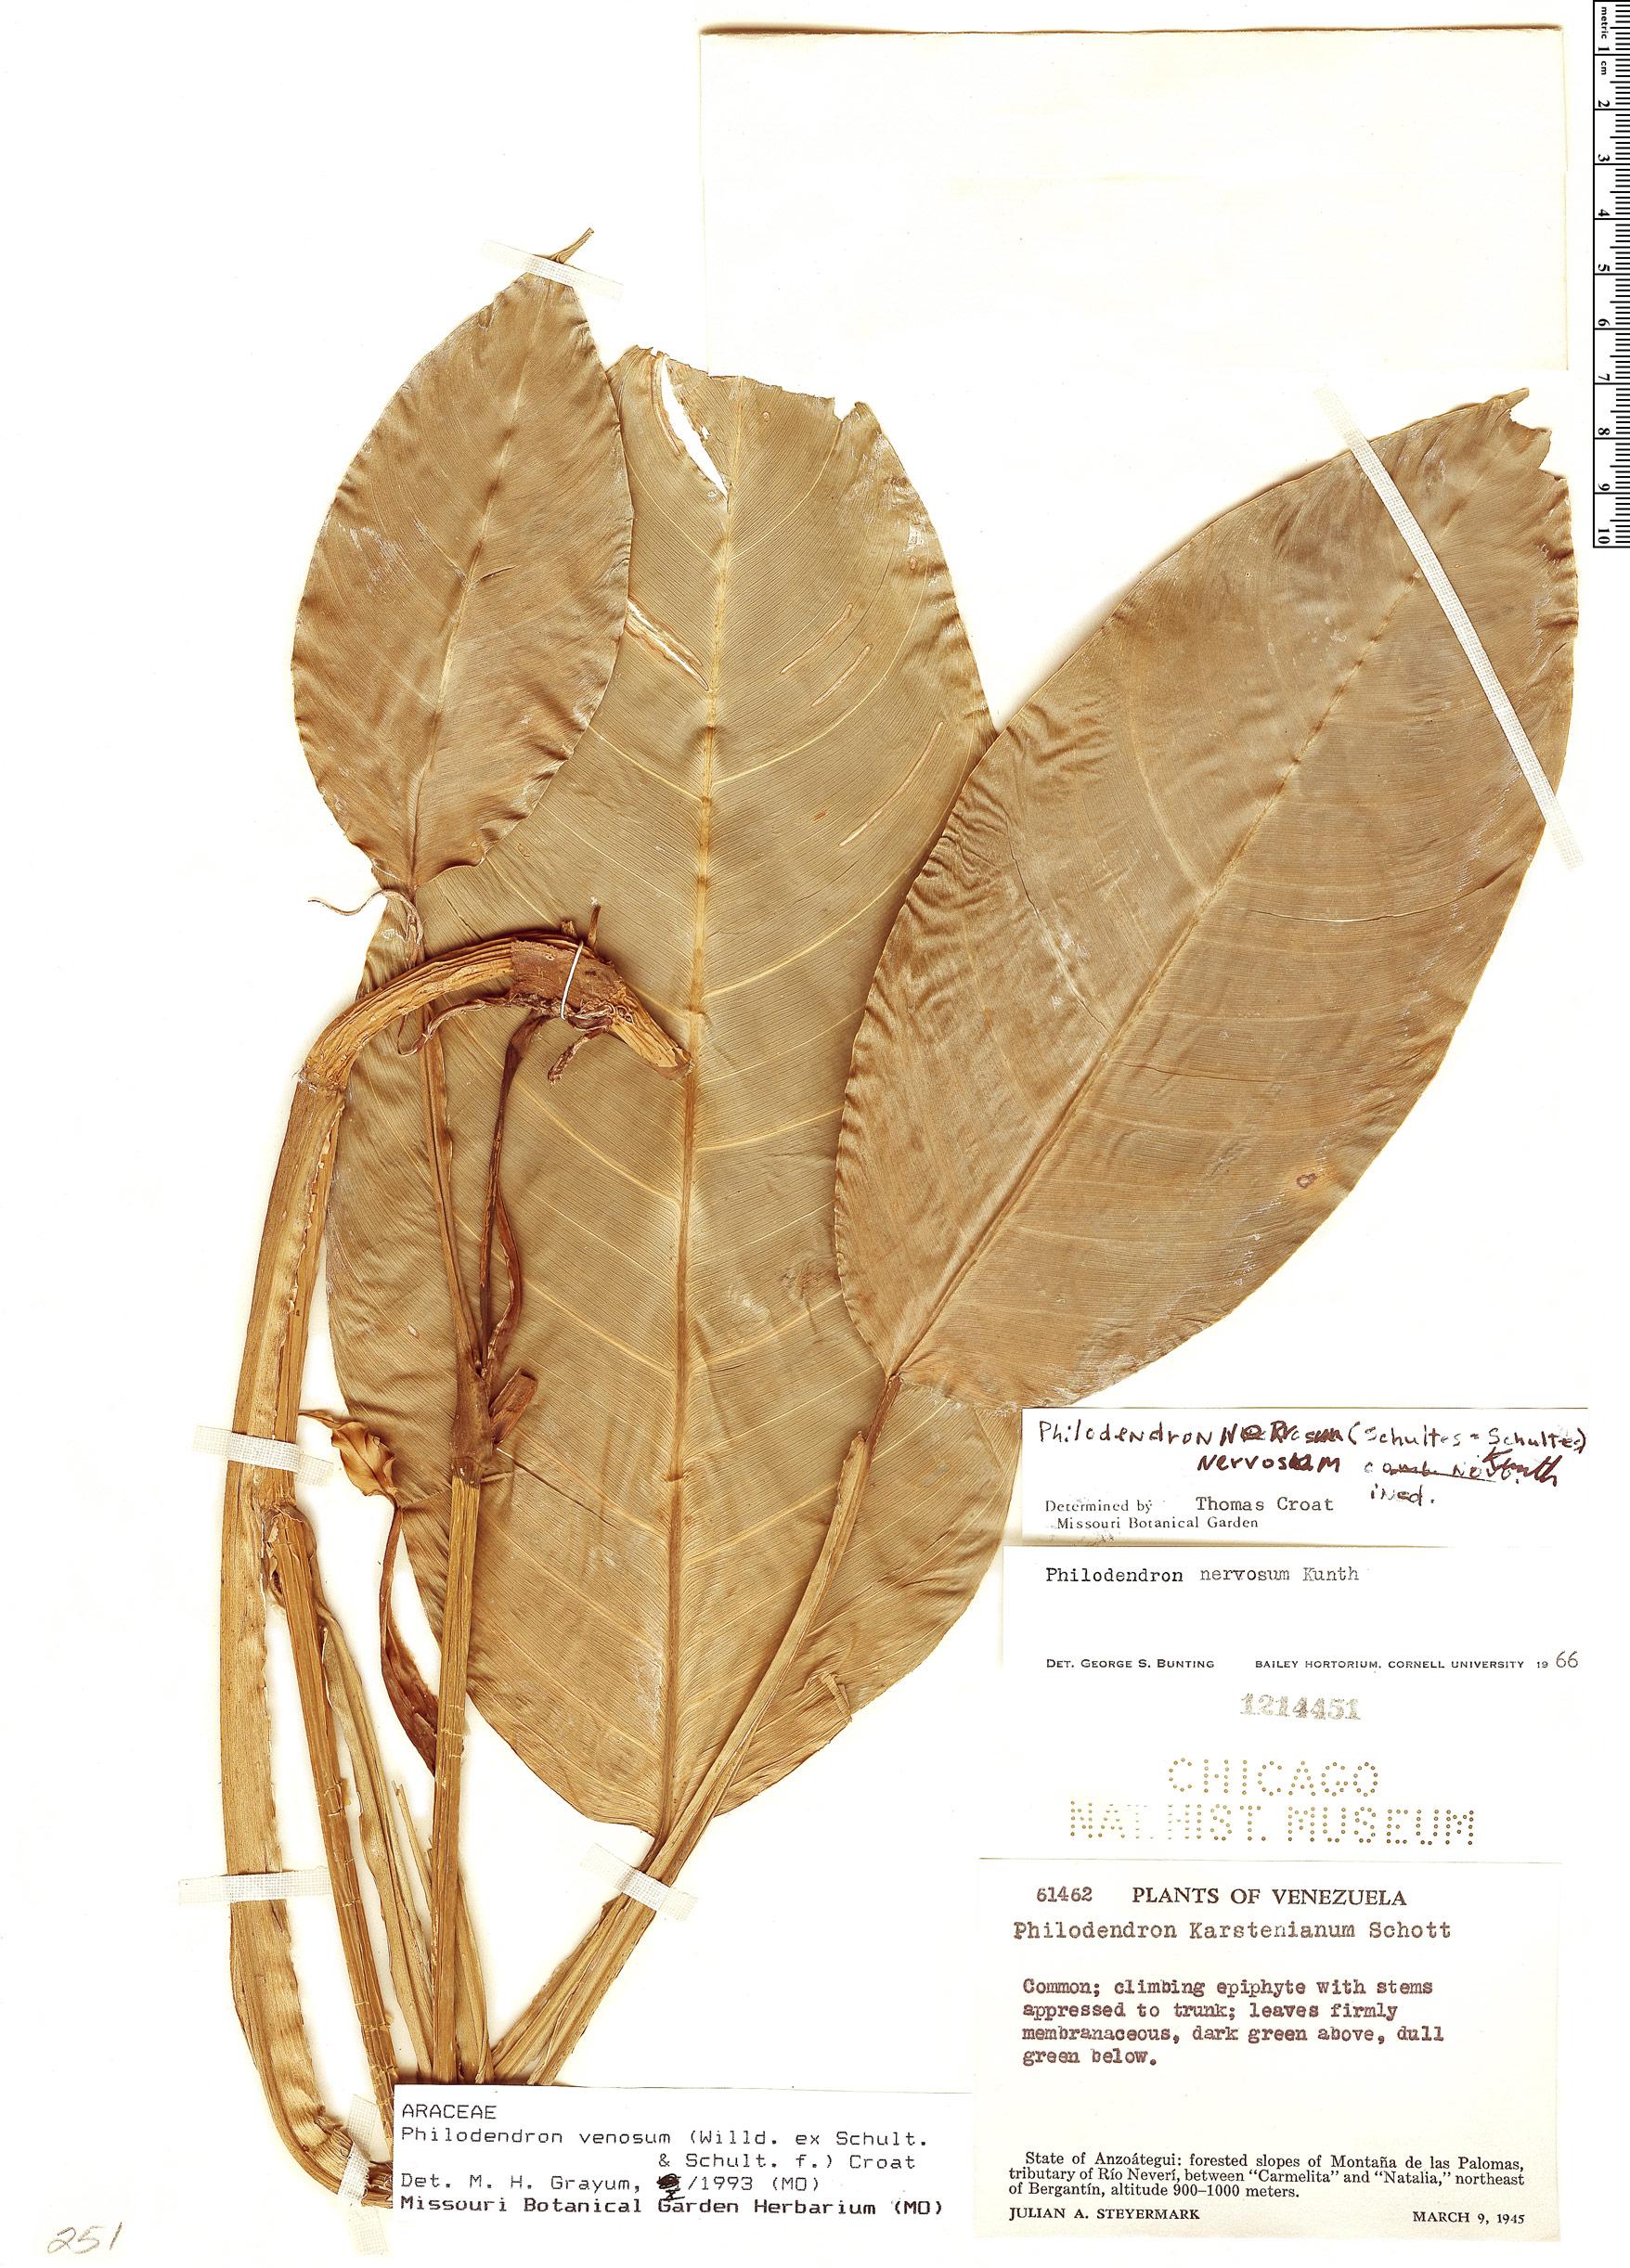 Specimen: Philodendron venosum